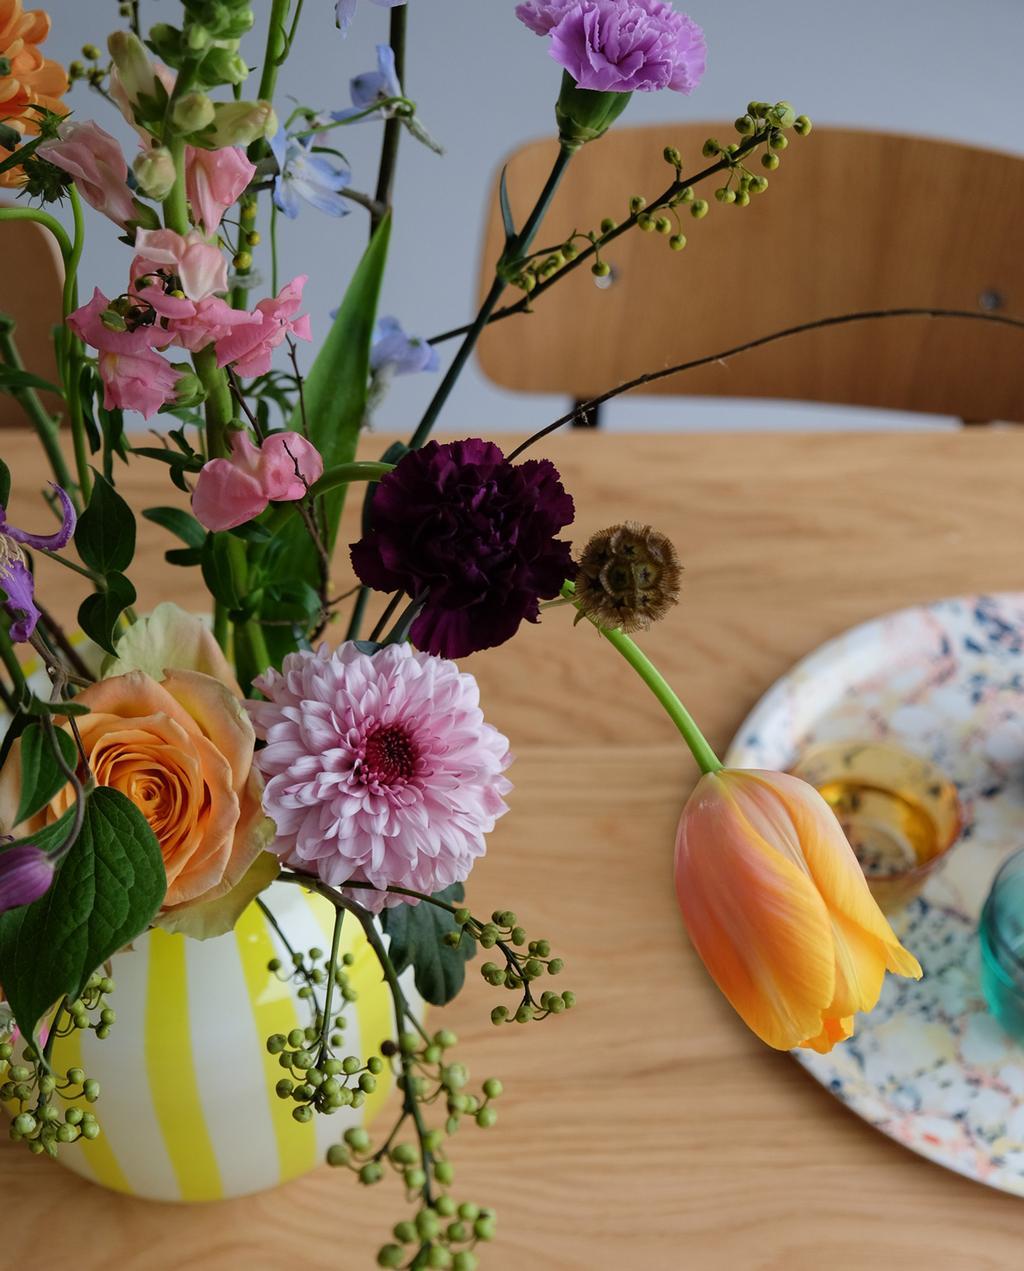 geel en wit gestreepte vaas van hay met bloemen